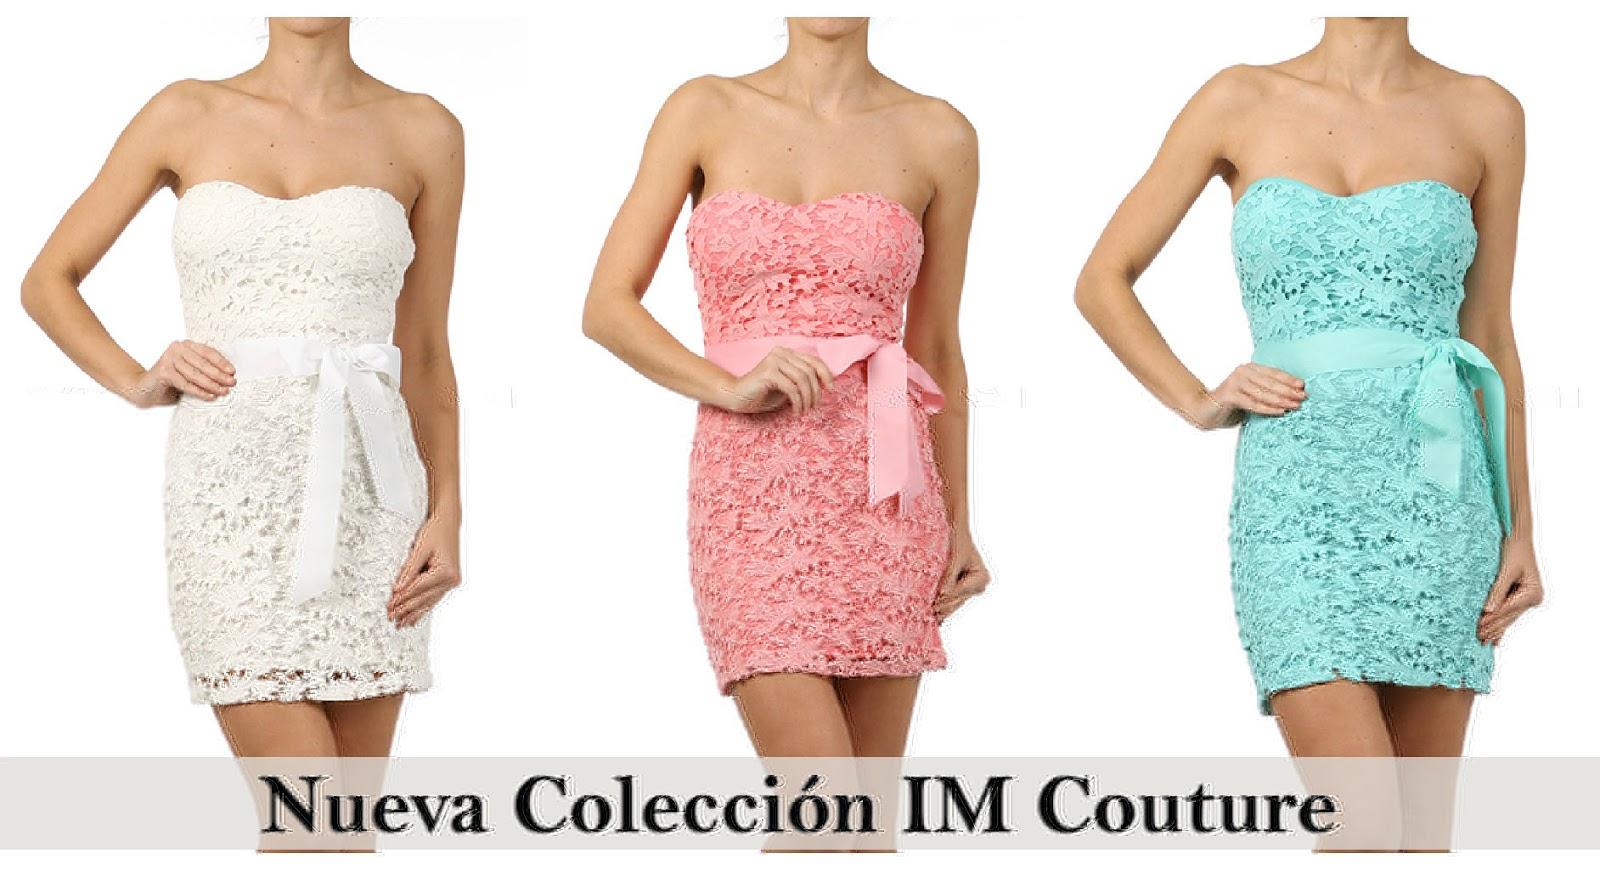 Boutiques IM Couture: enero 2013